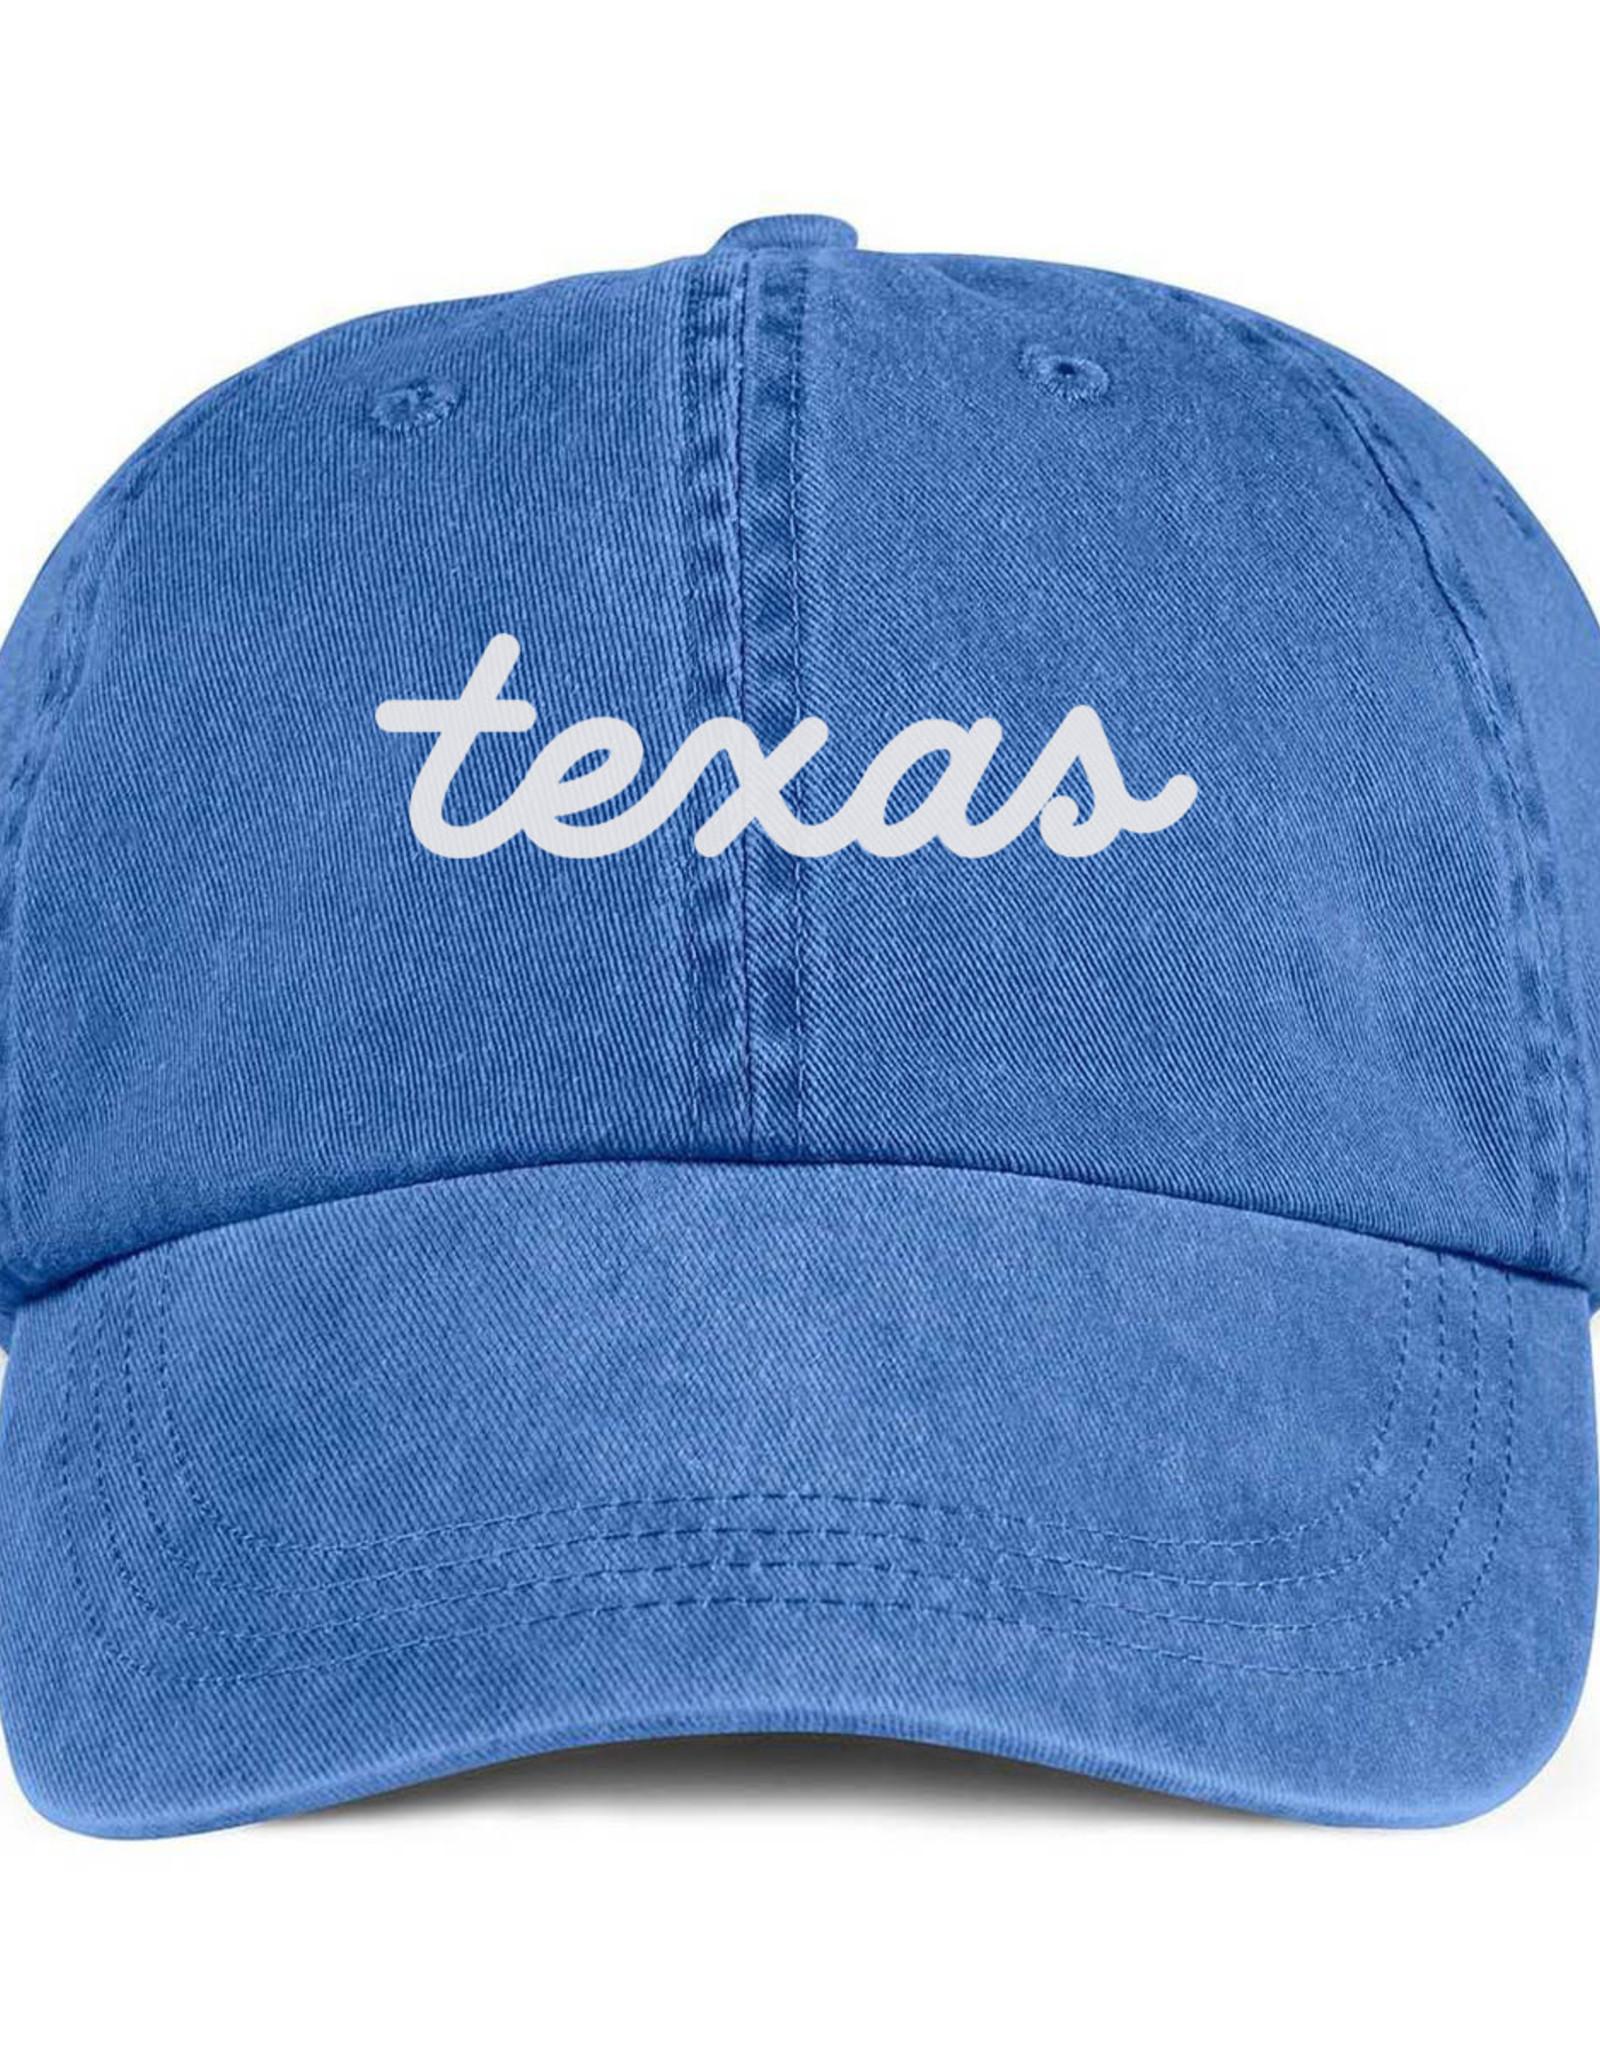 Wink Texas Script hat